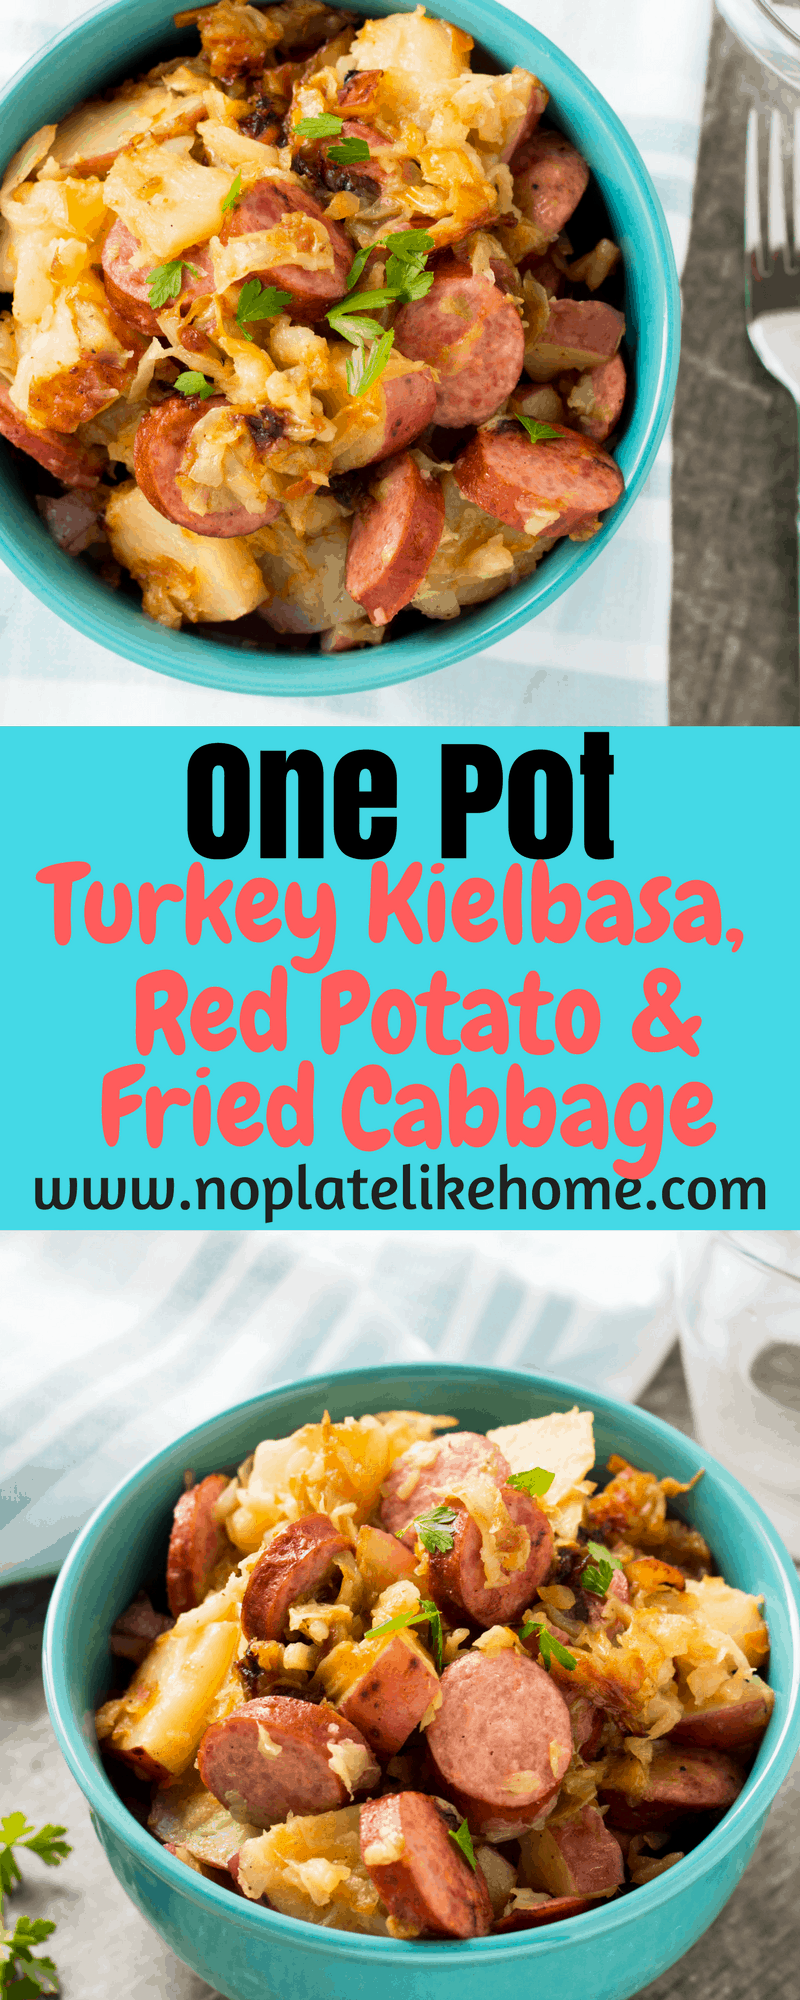 One Pot Turkey Kielbasa, Red Potato and Fried Cabbage